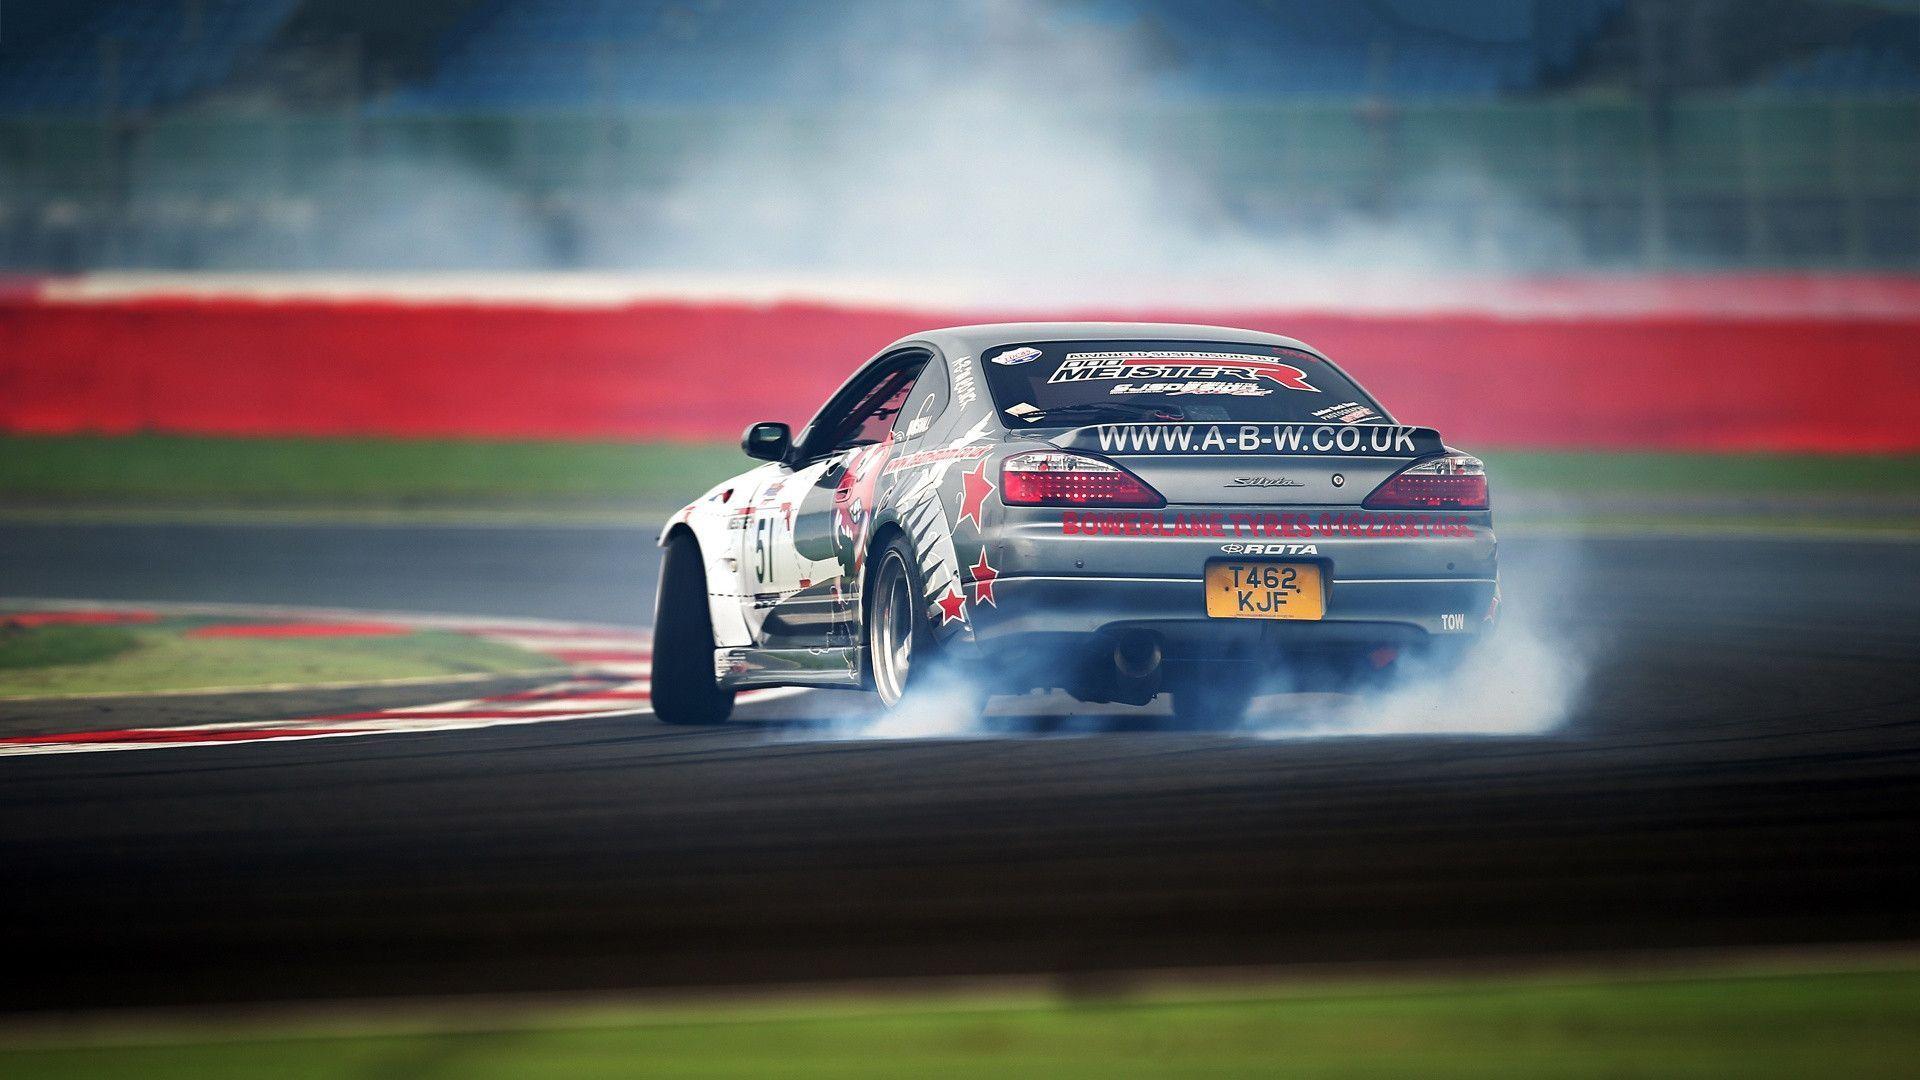 Supra Drift Wallpaper Full Hd Ntd Nissan S15 Drift Cars Drifting